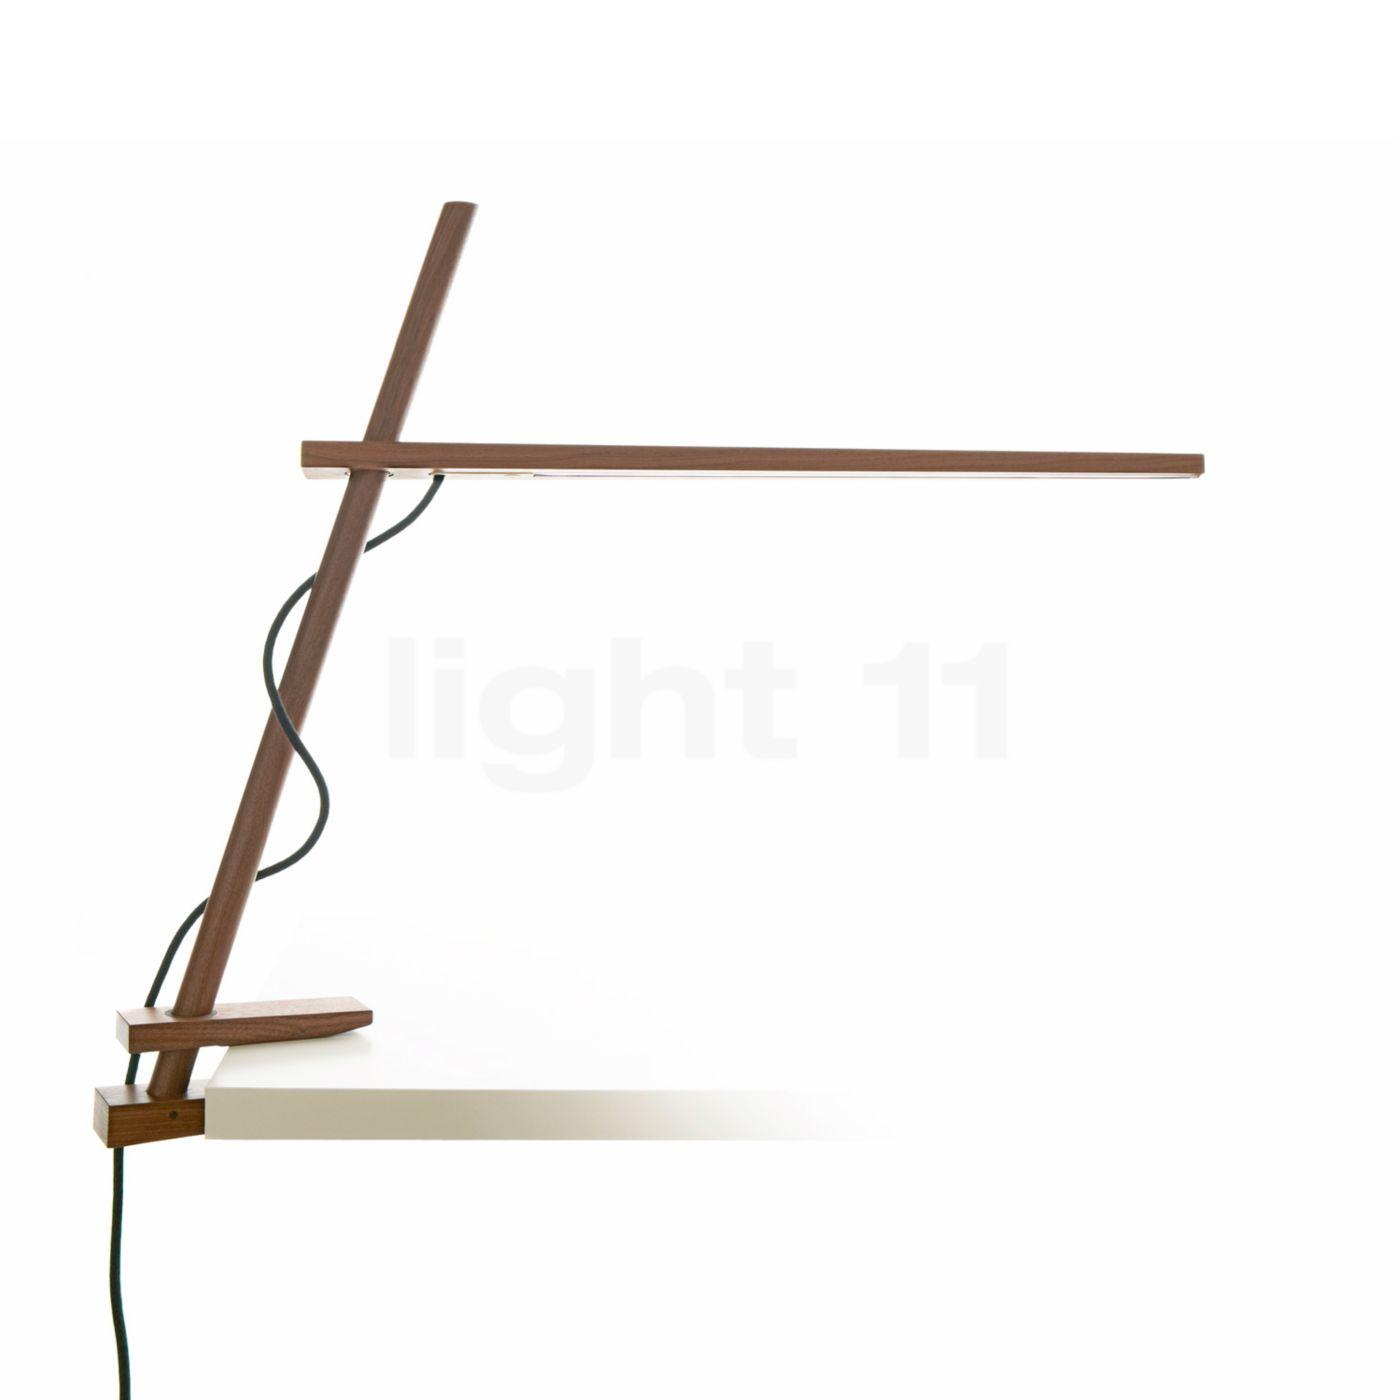 Pablo Designs Clamp Klemmleuchte LED, Walnuss CLAM-CLP-WLN-UNV